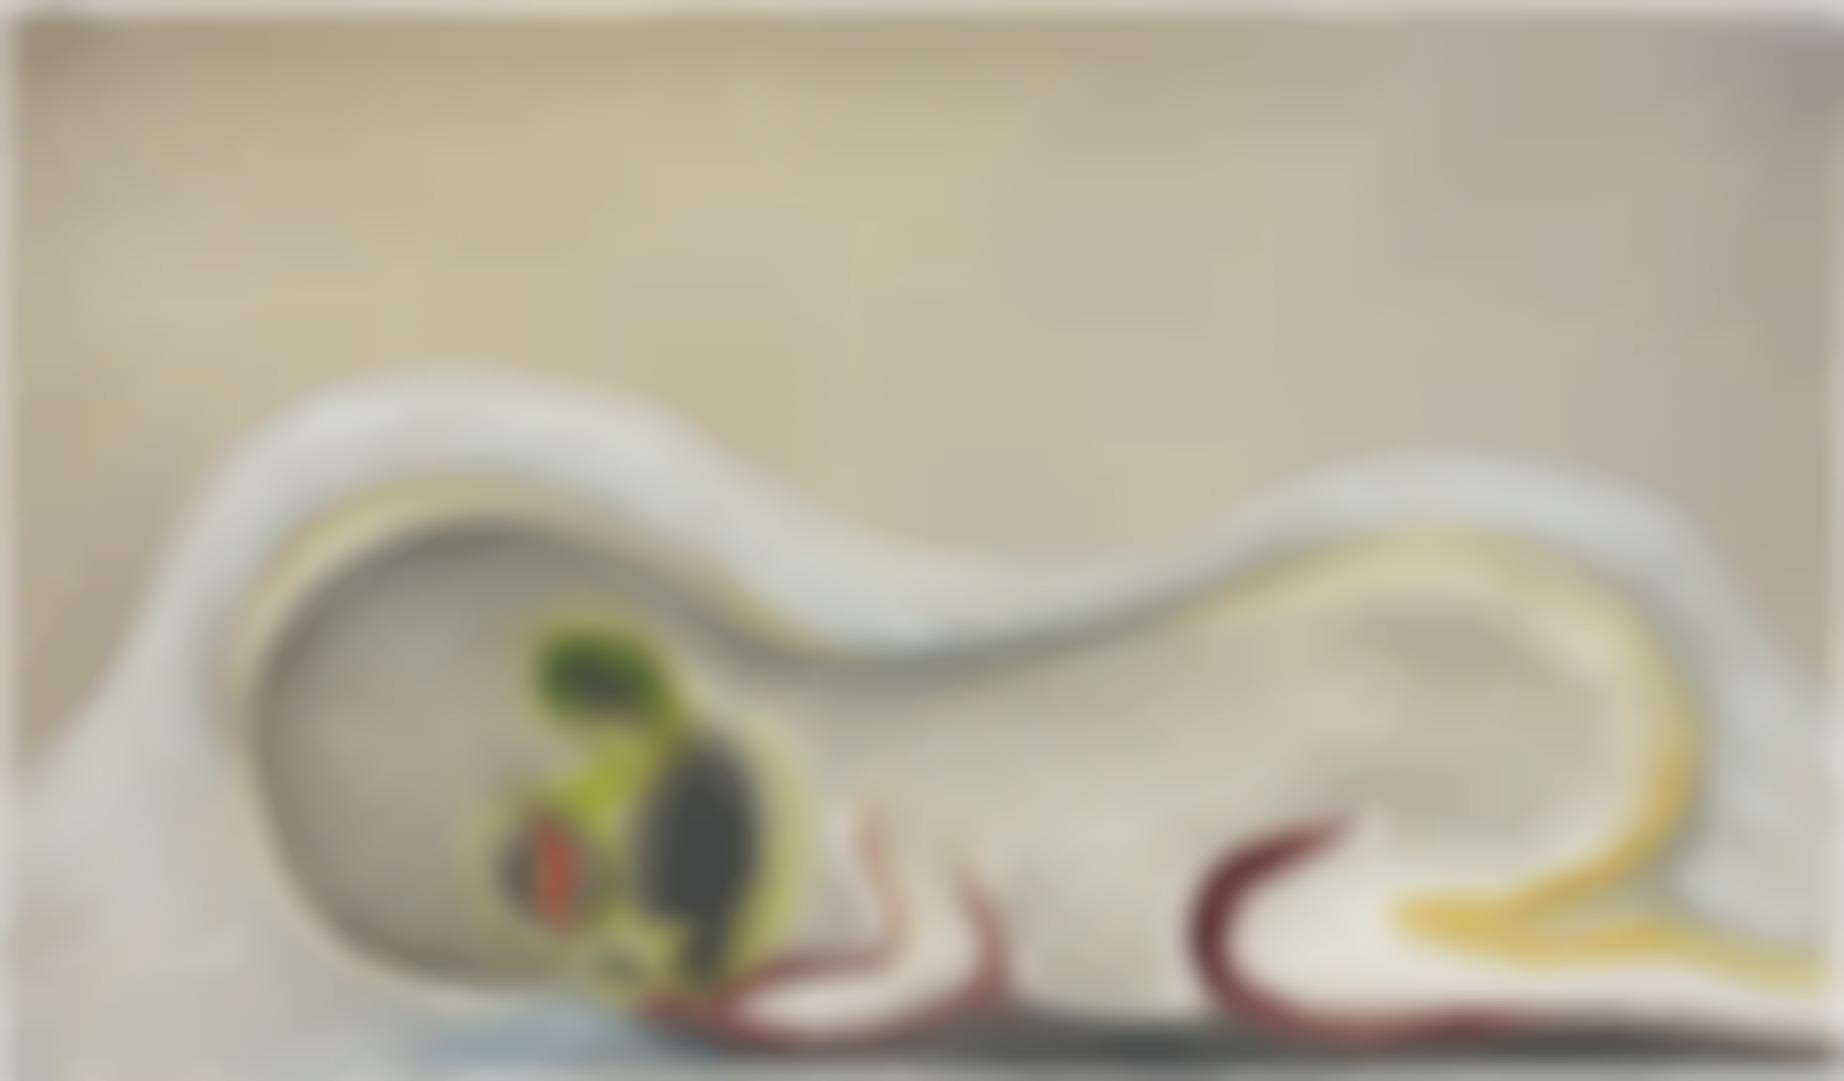 Izumi Kato-Untitled-2004